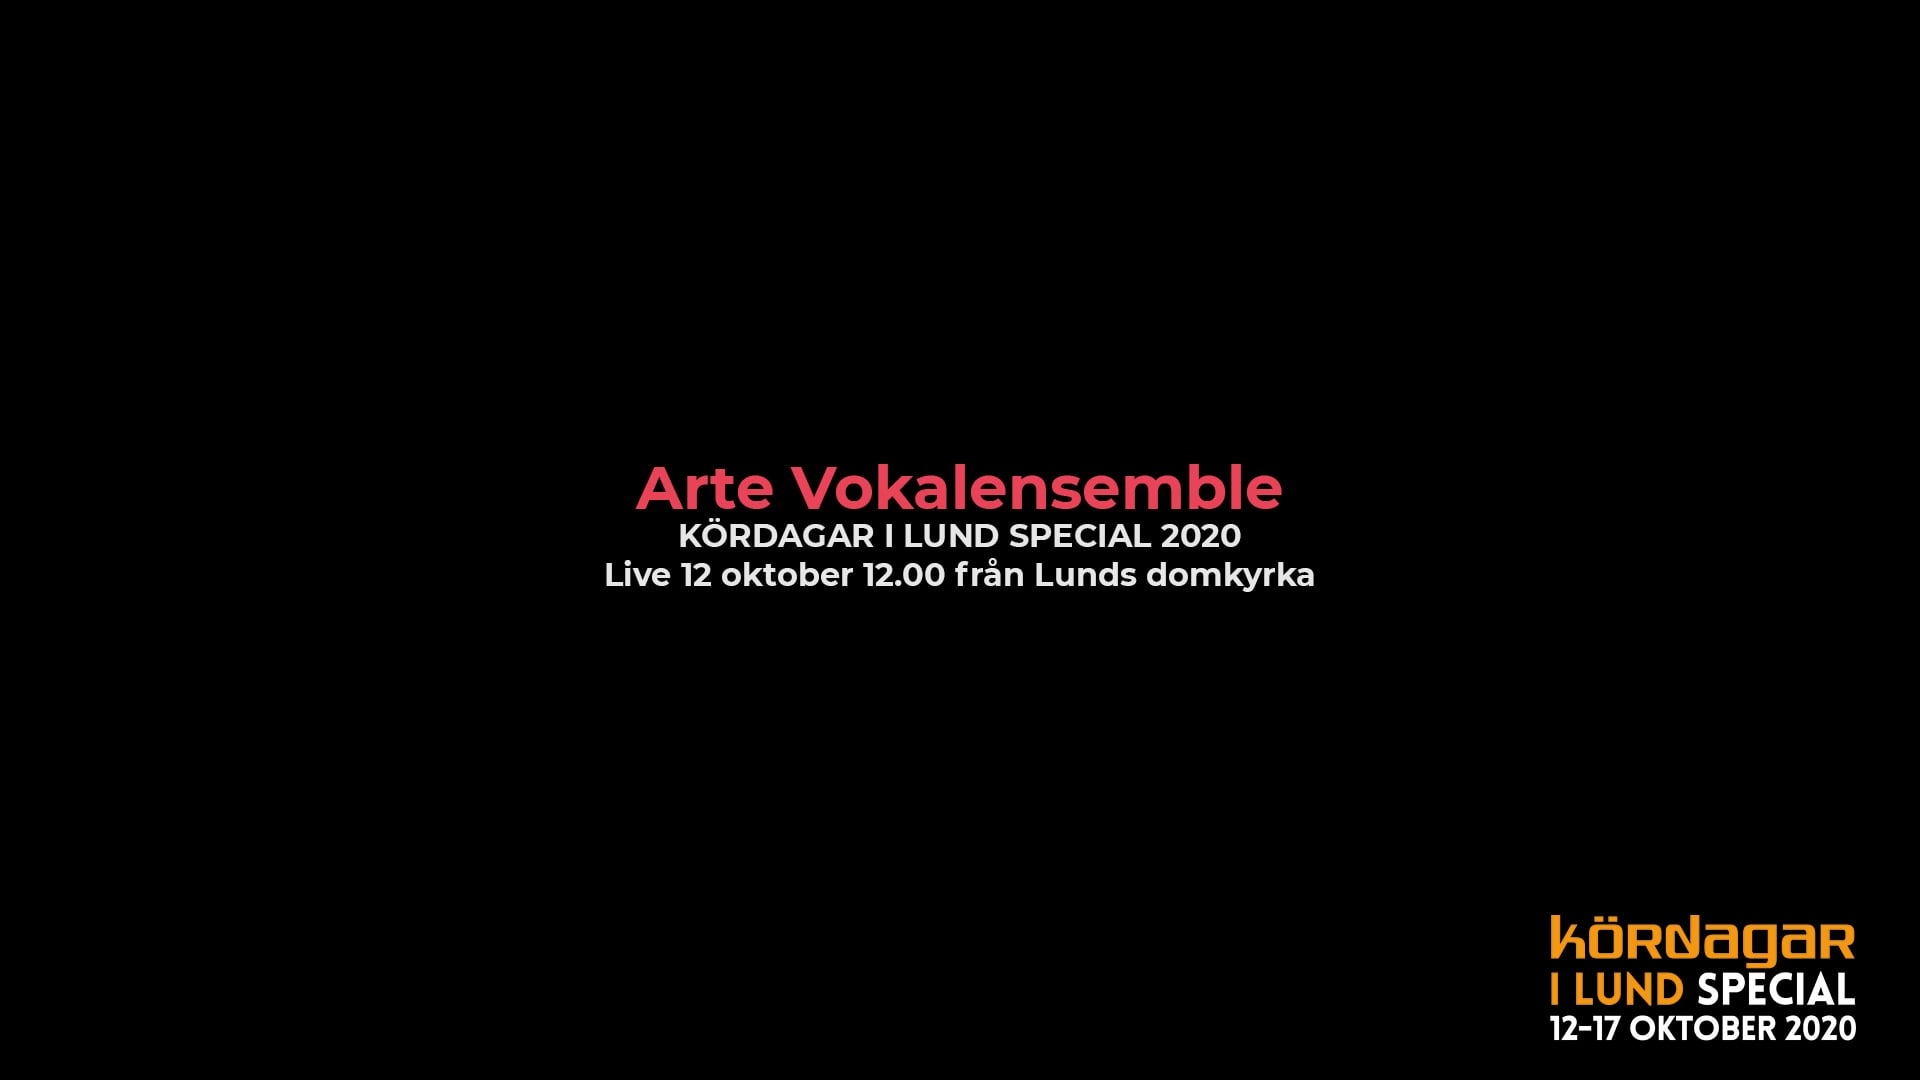 lund choral festival - arte vokalensemble